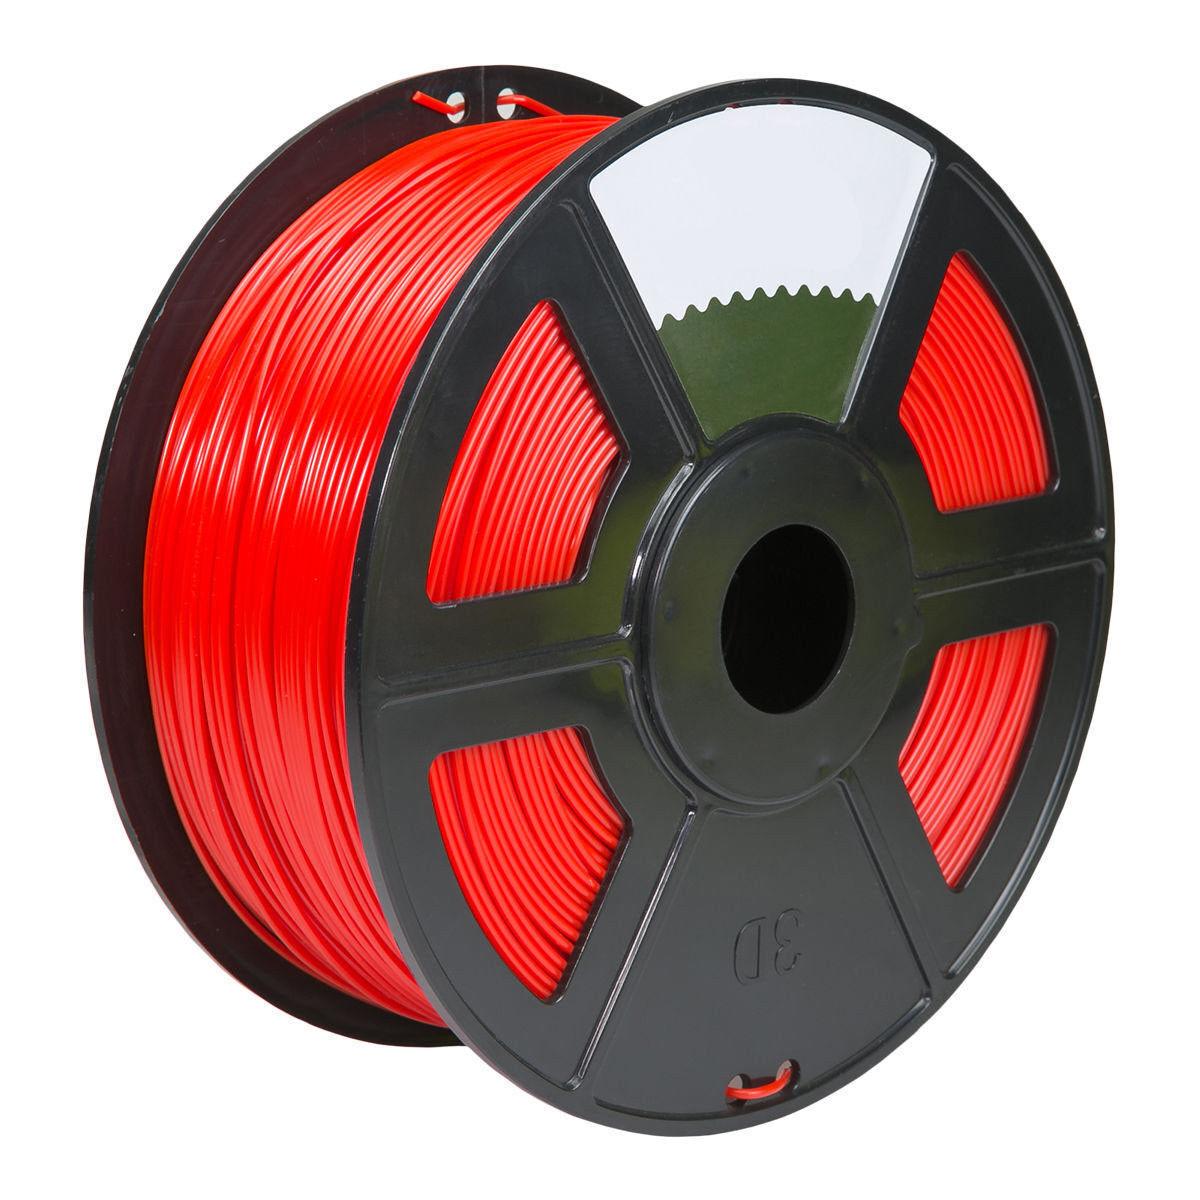 4PK red Color 3D Printer Filament 1.75mm 1KG ABS For Print MakerBot RepRap